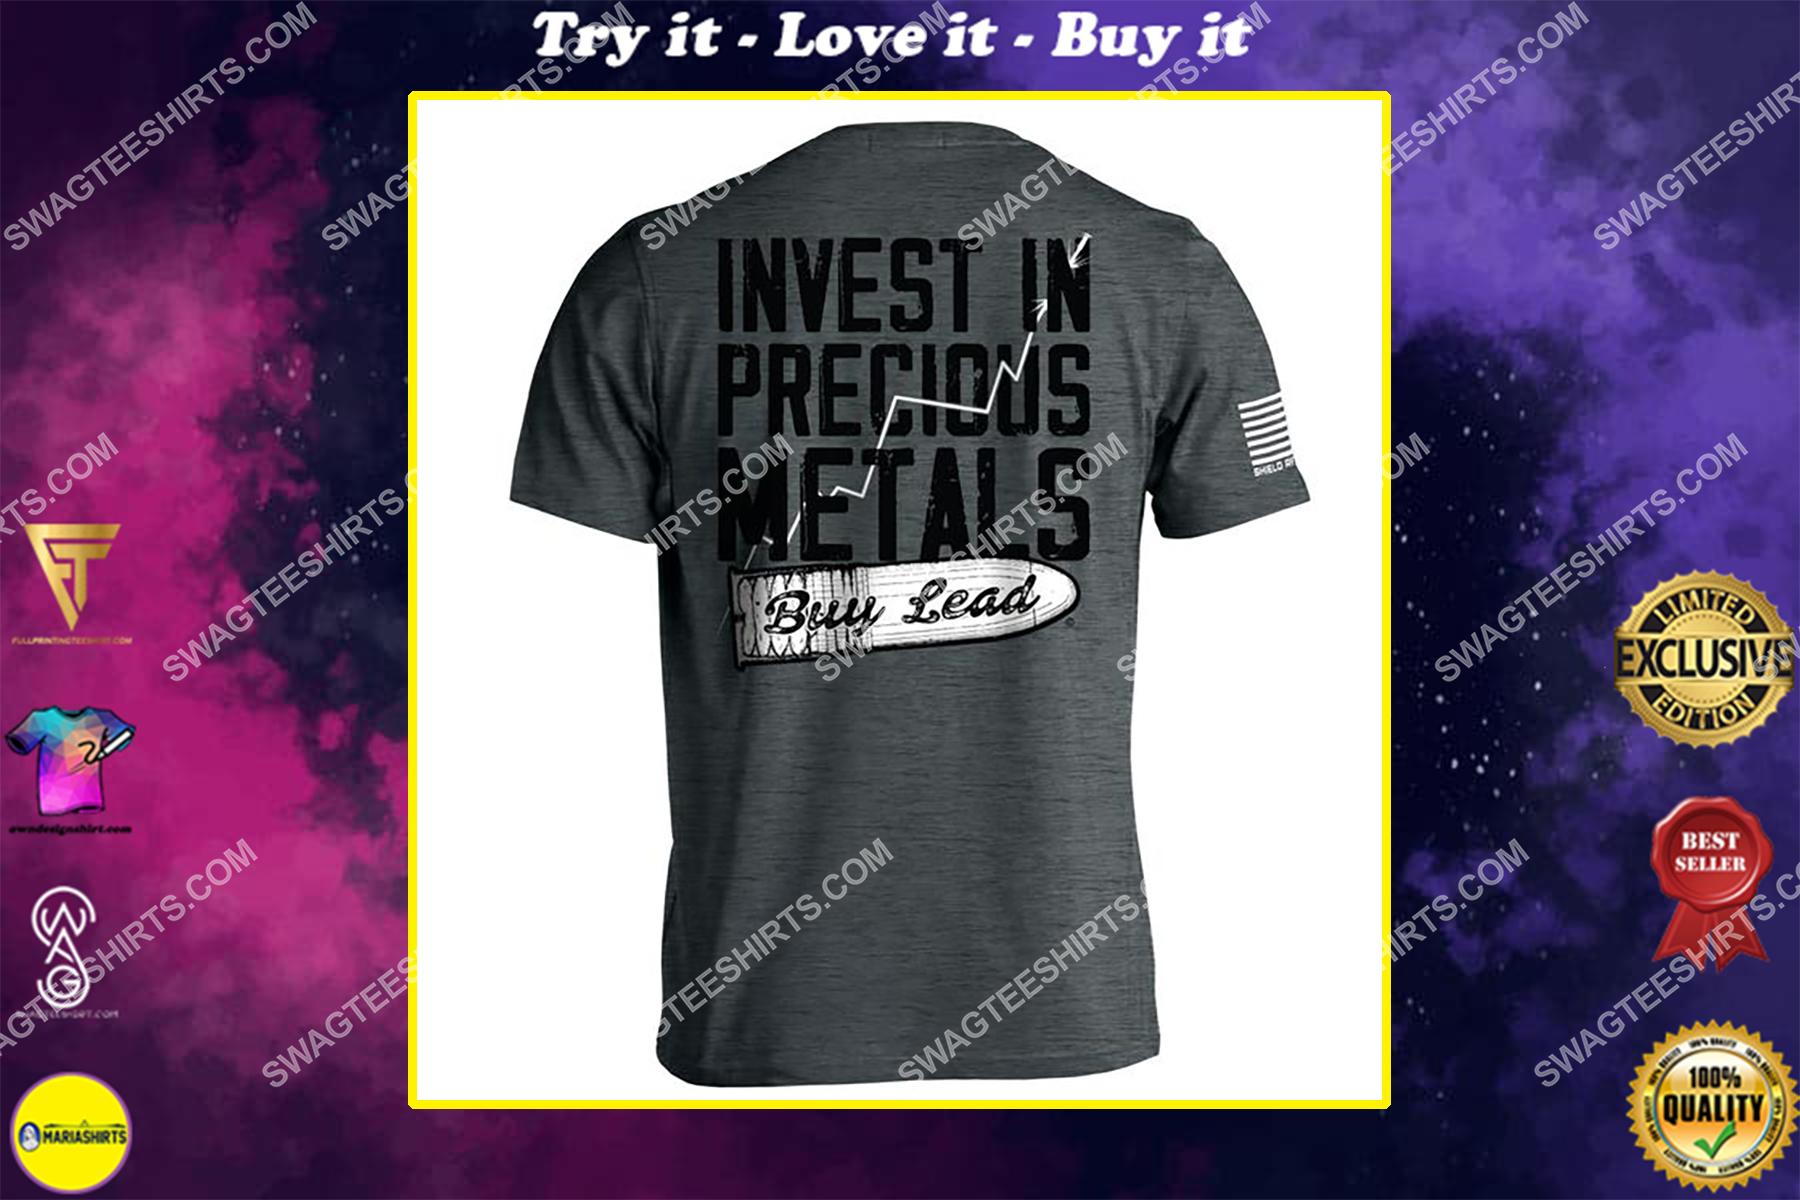 invest in precious metals buy lead gun control political shirt